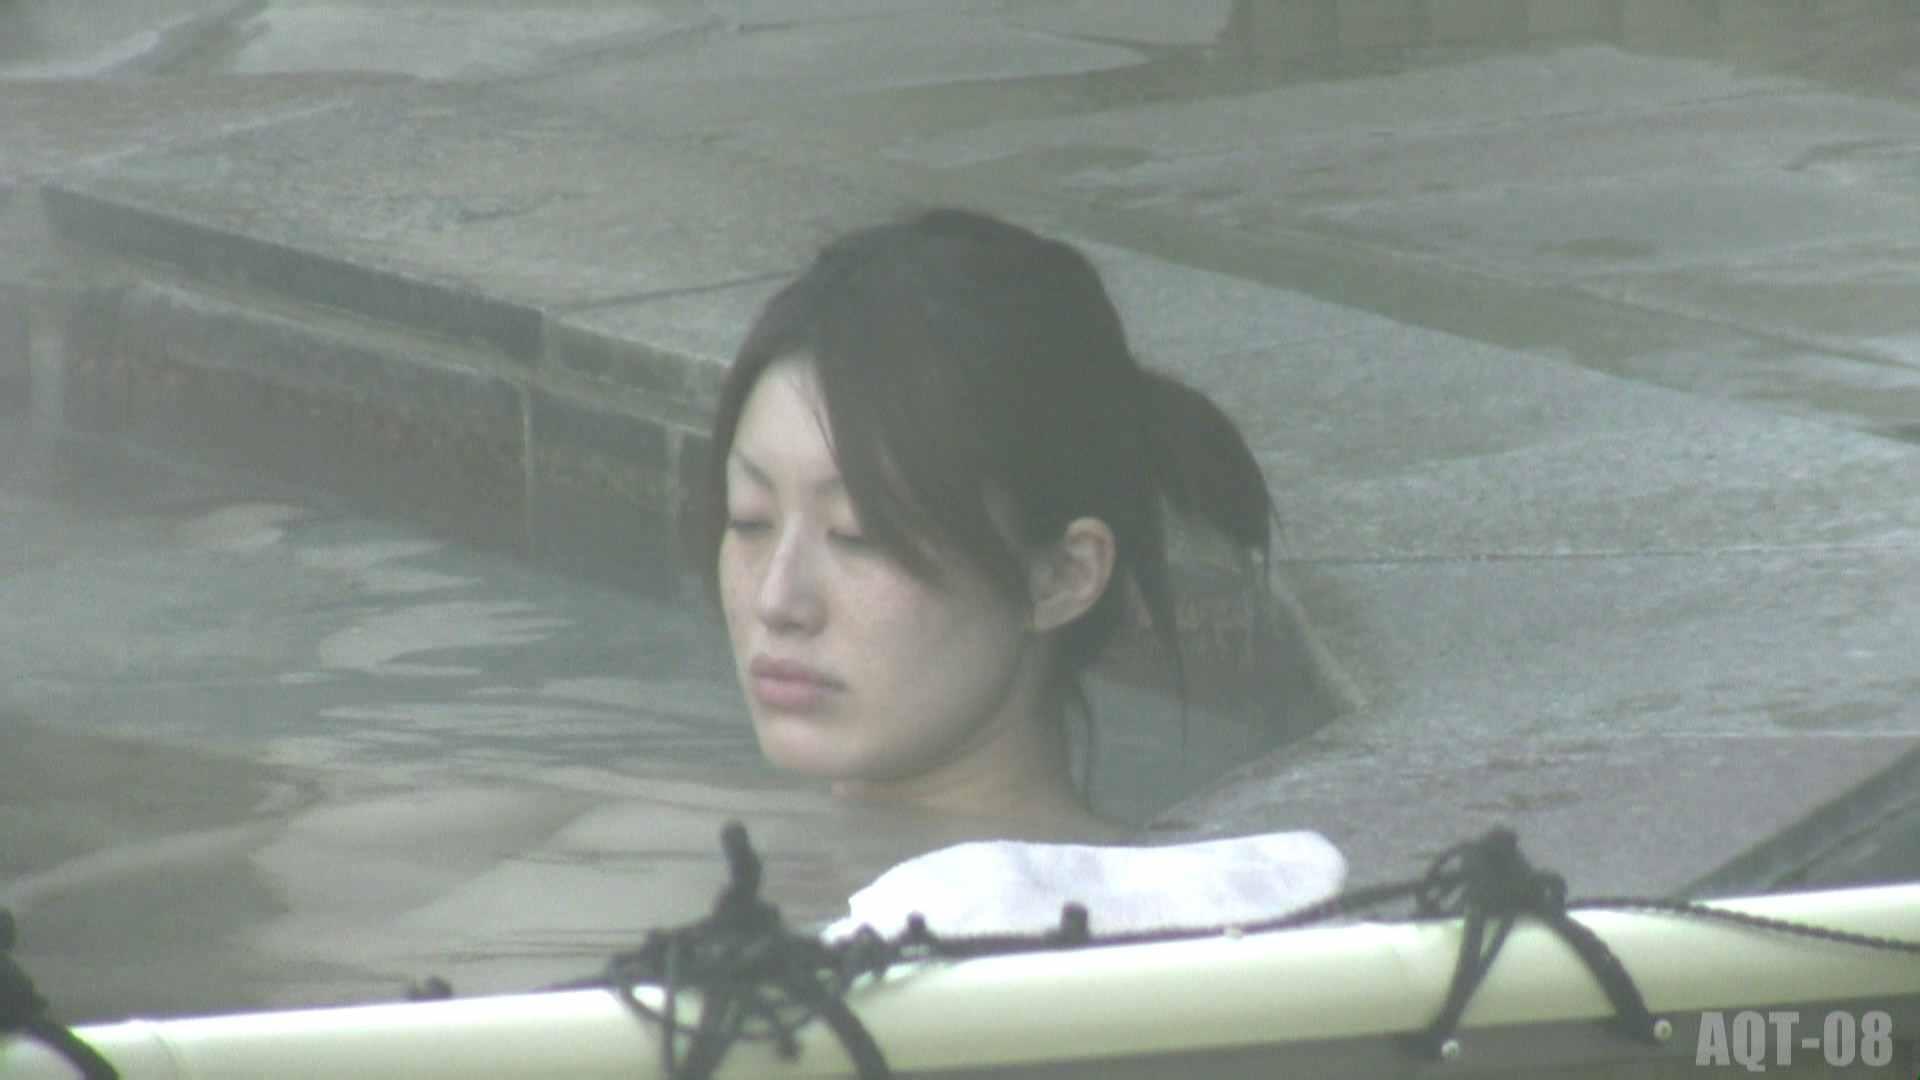 Aquaな露天風呂Vol.775 盗撮師作品 AV無料動画キャプチャ 98pic 98